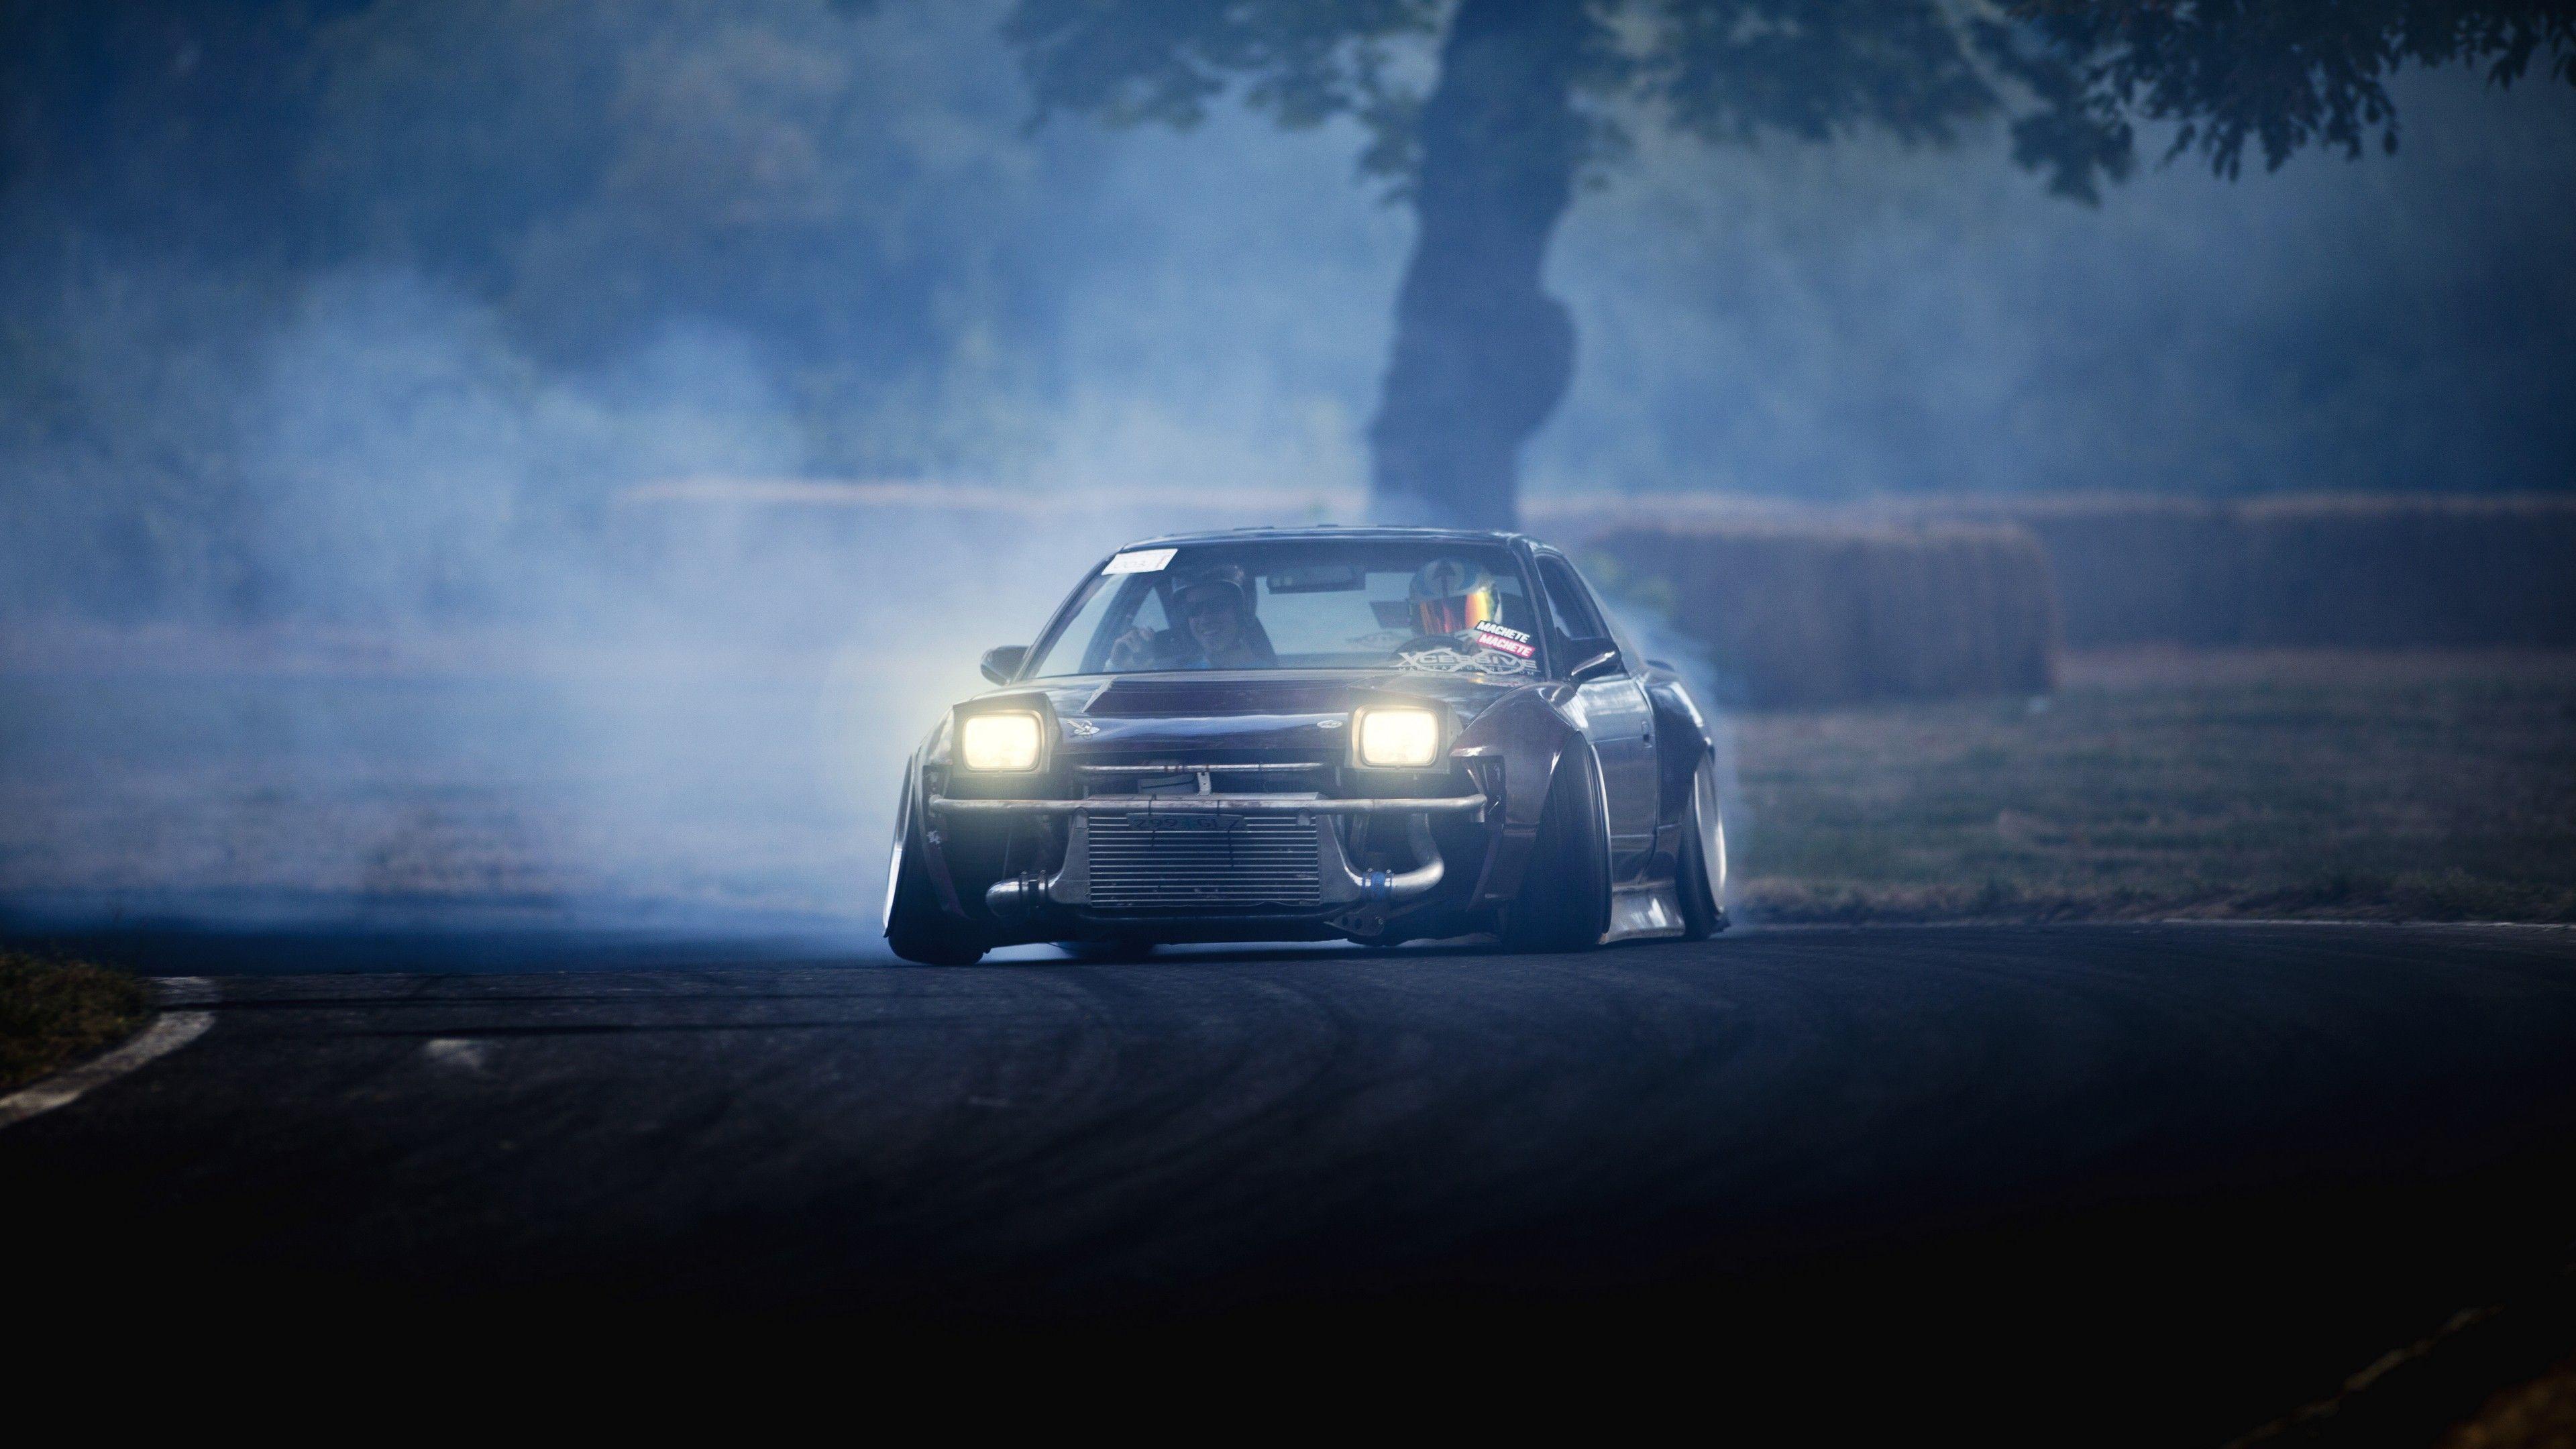 Drifting Car 4k Smoke Wallpapers Hd Wallpapers Drifting Cars Wallpapers Drift Wallpapers 4k Wallpapers Drifting Cars Car Wallpapers Smoke Wallpaper